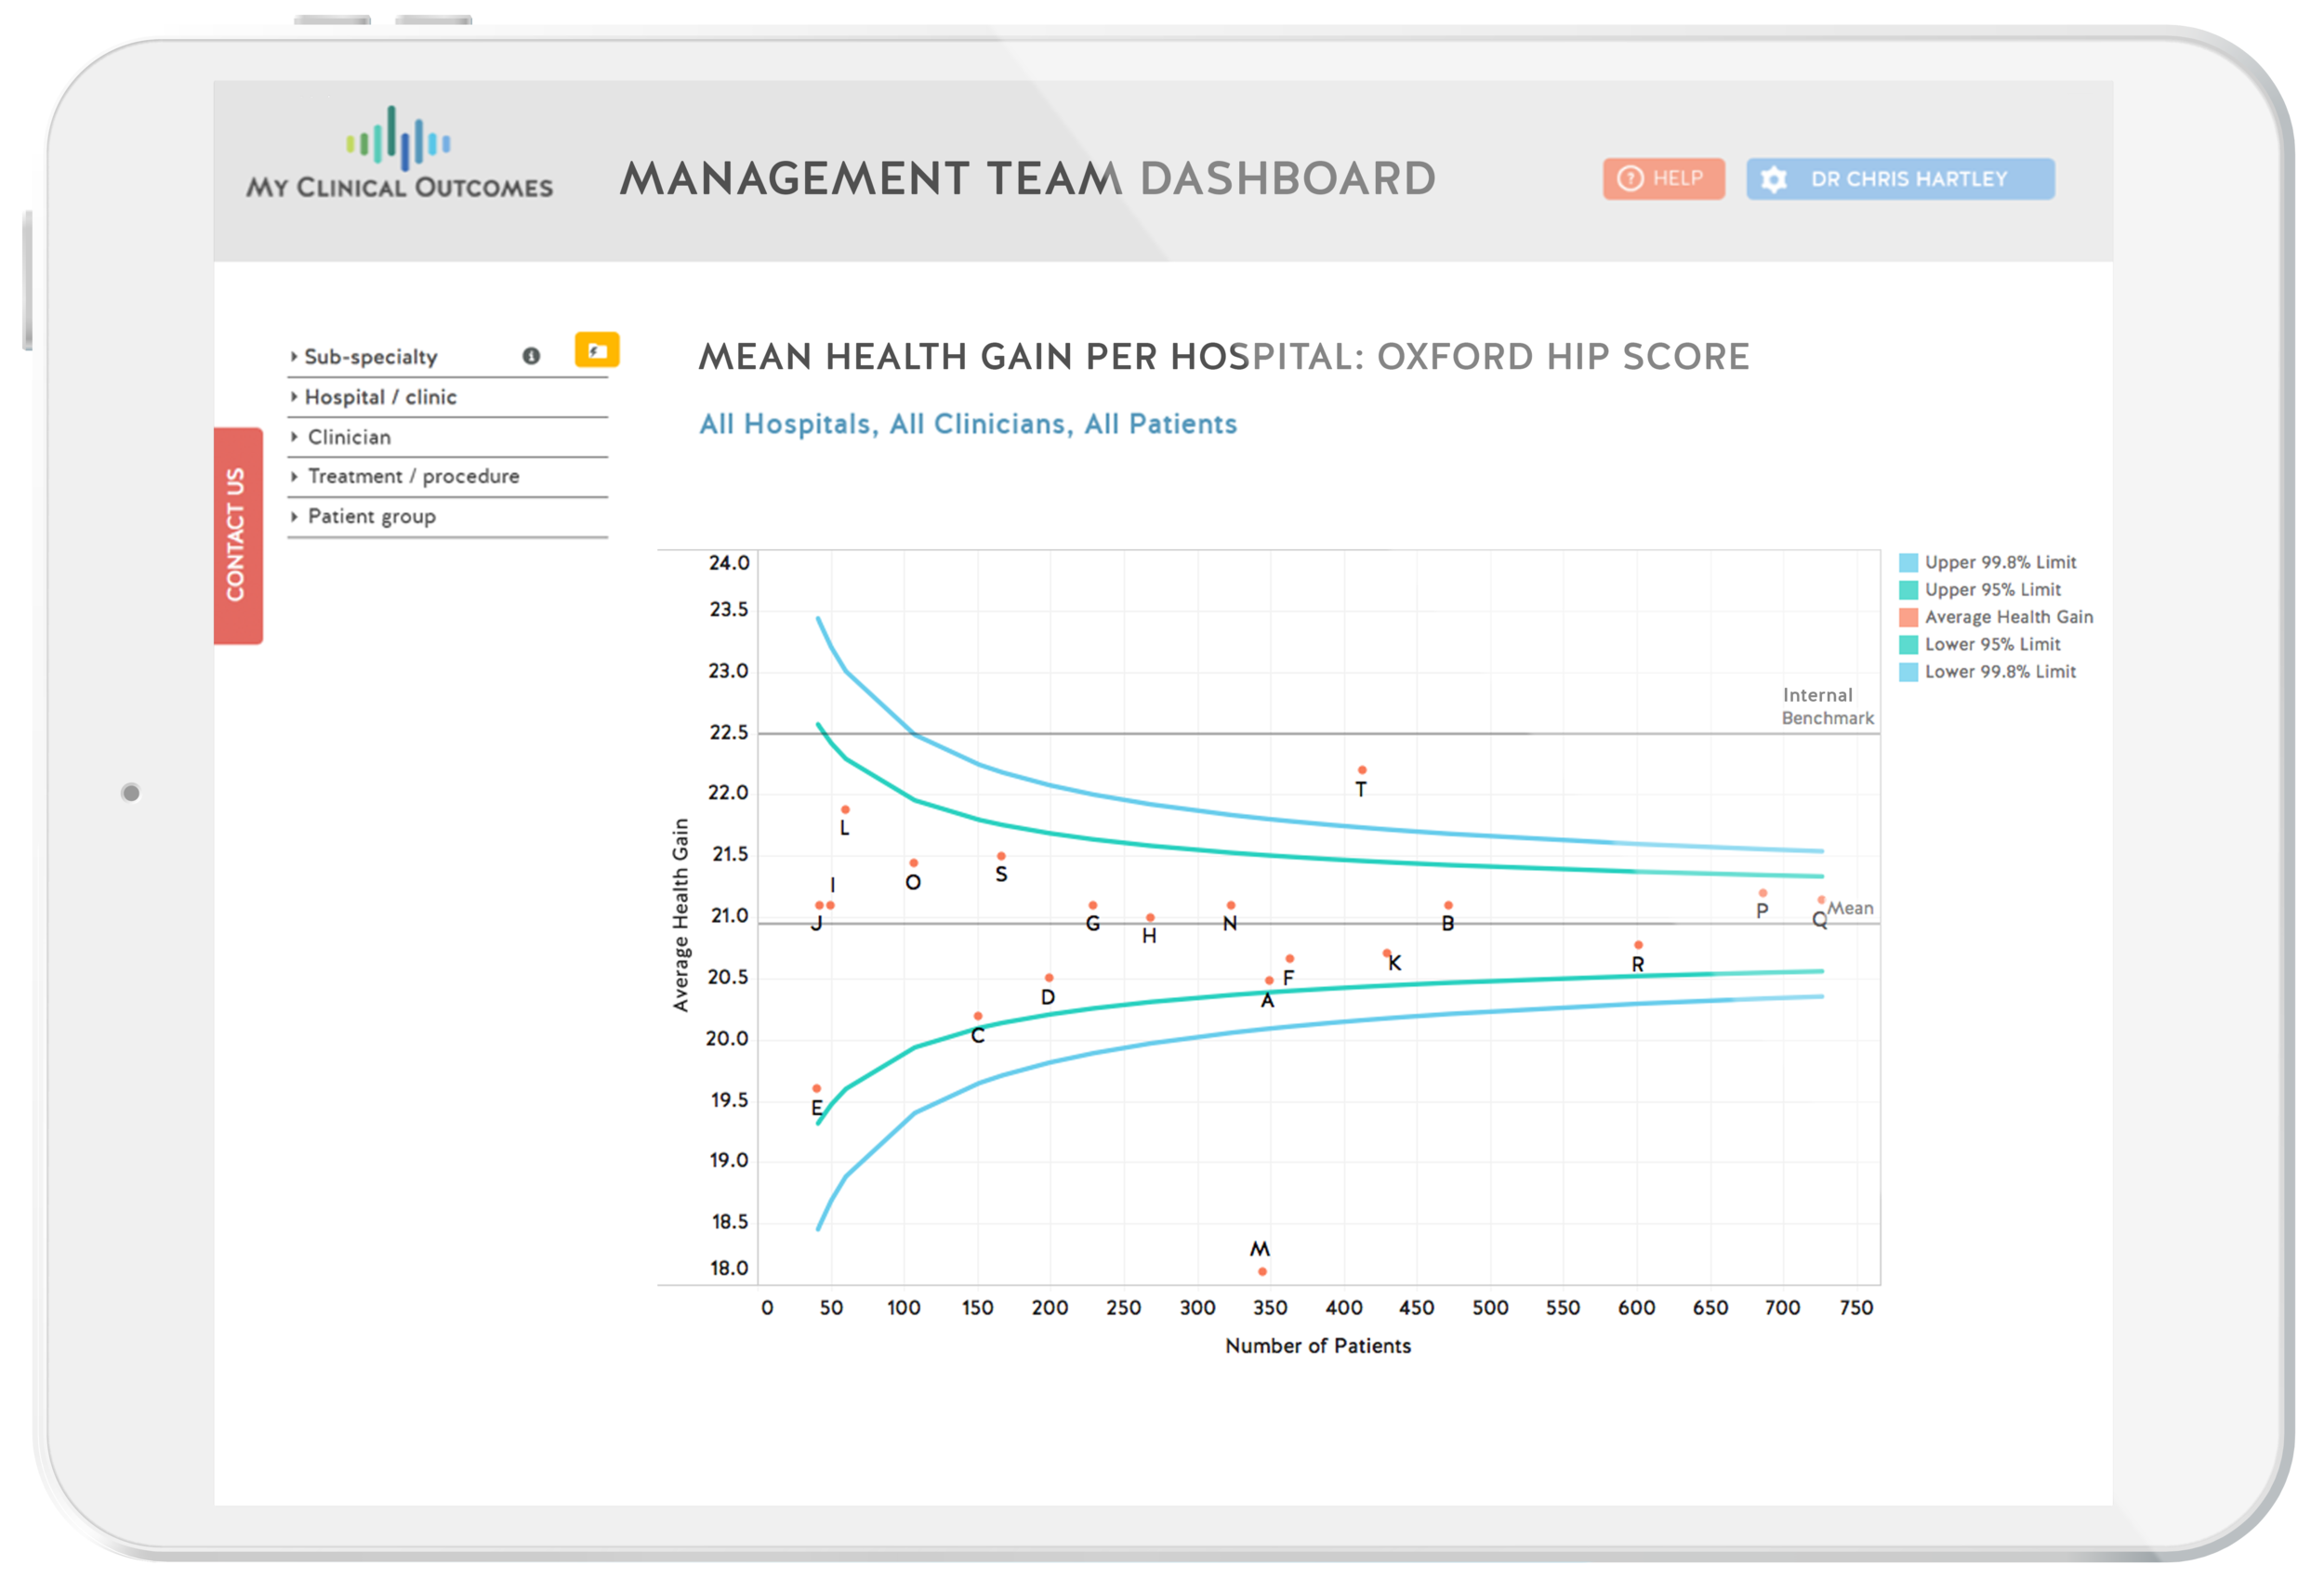 Value-Based Health Care - Management Dashboard